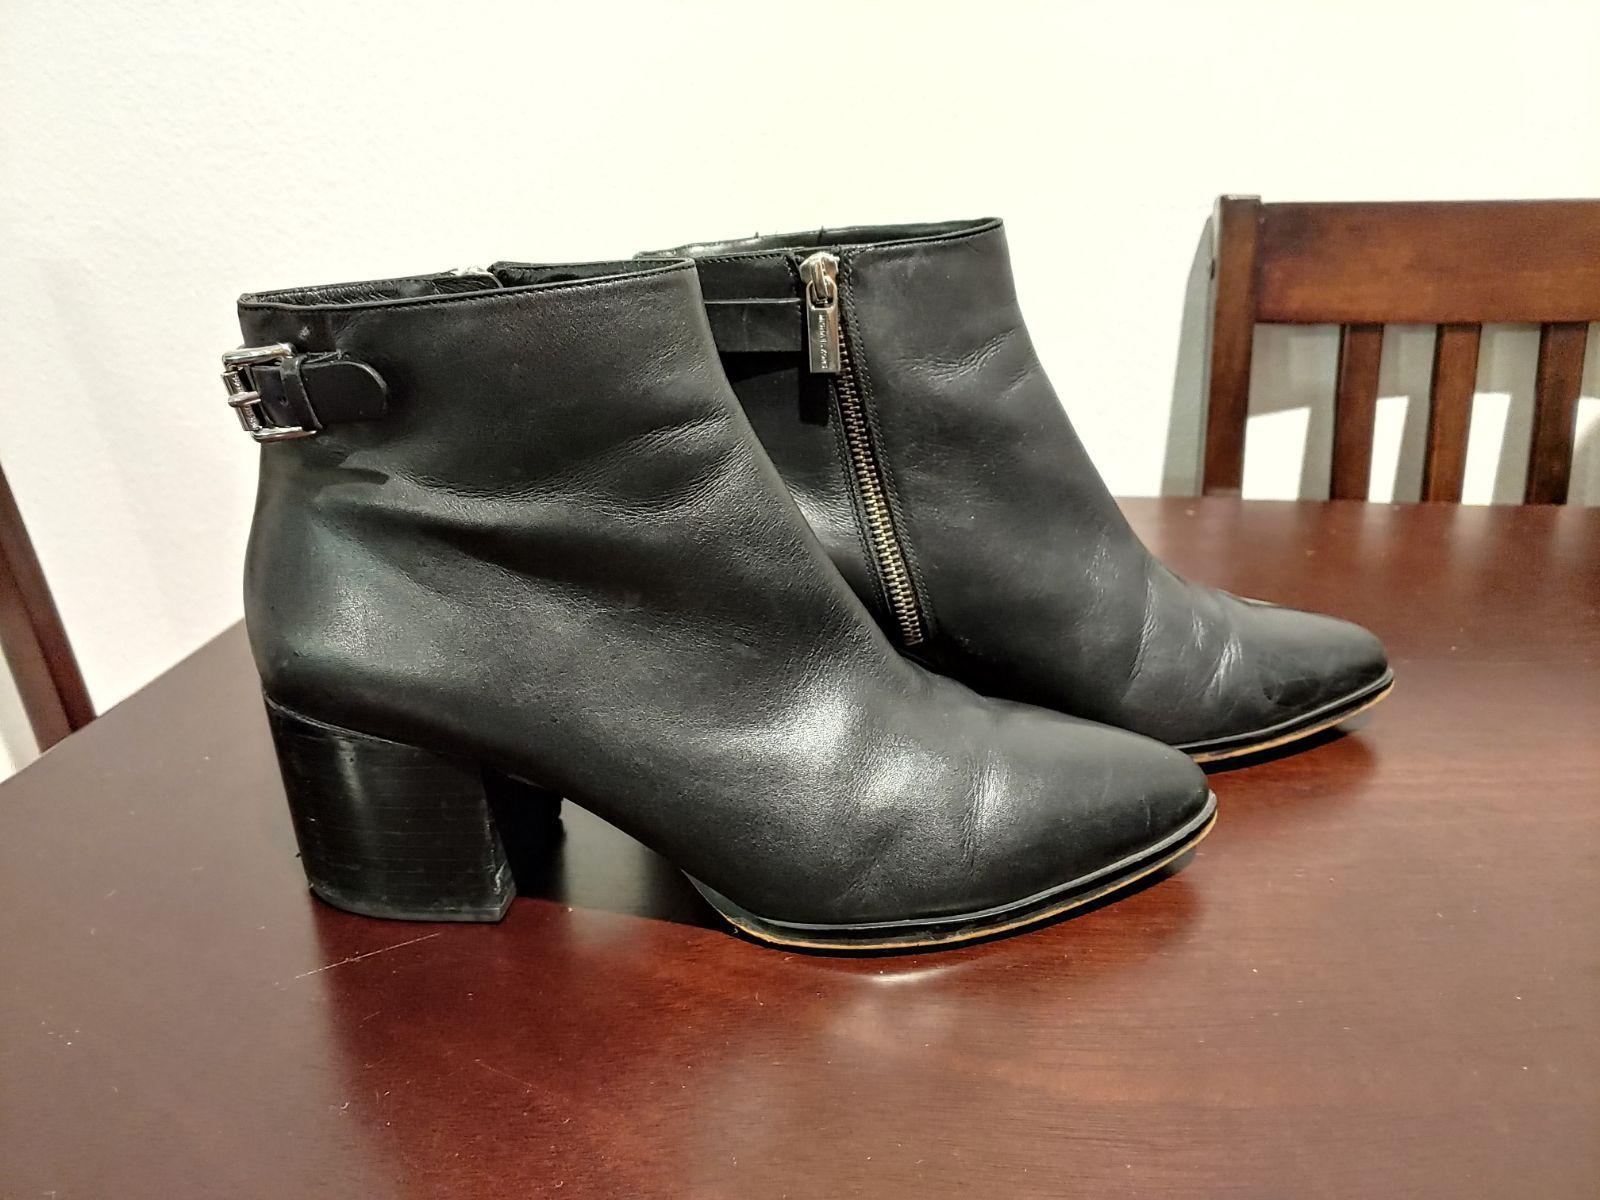 Michael Kors Saylor Leather Ankle Boot